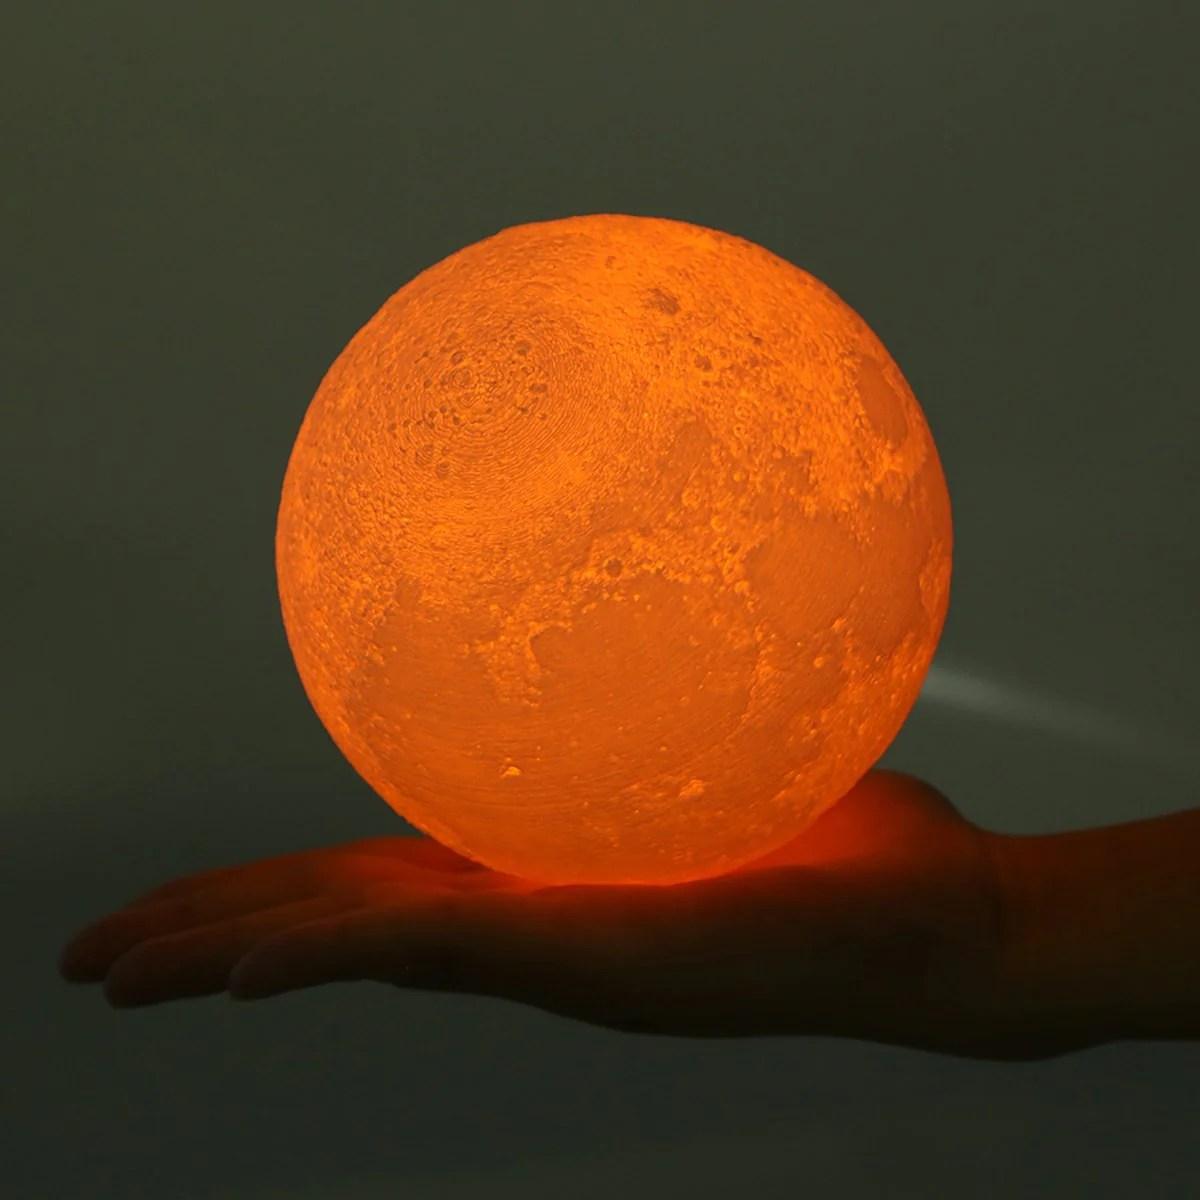 Fullsize Of Moon Night Light